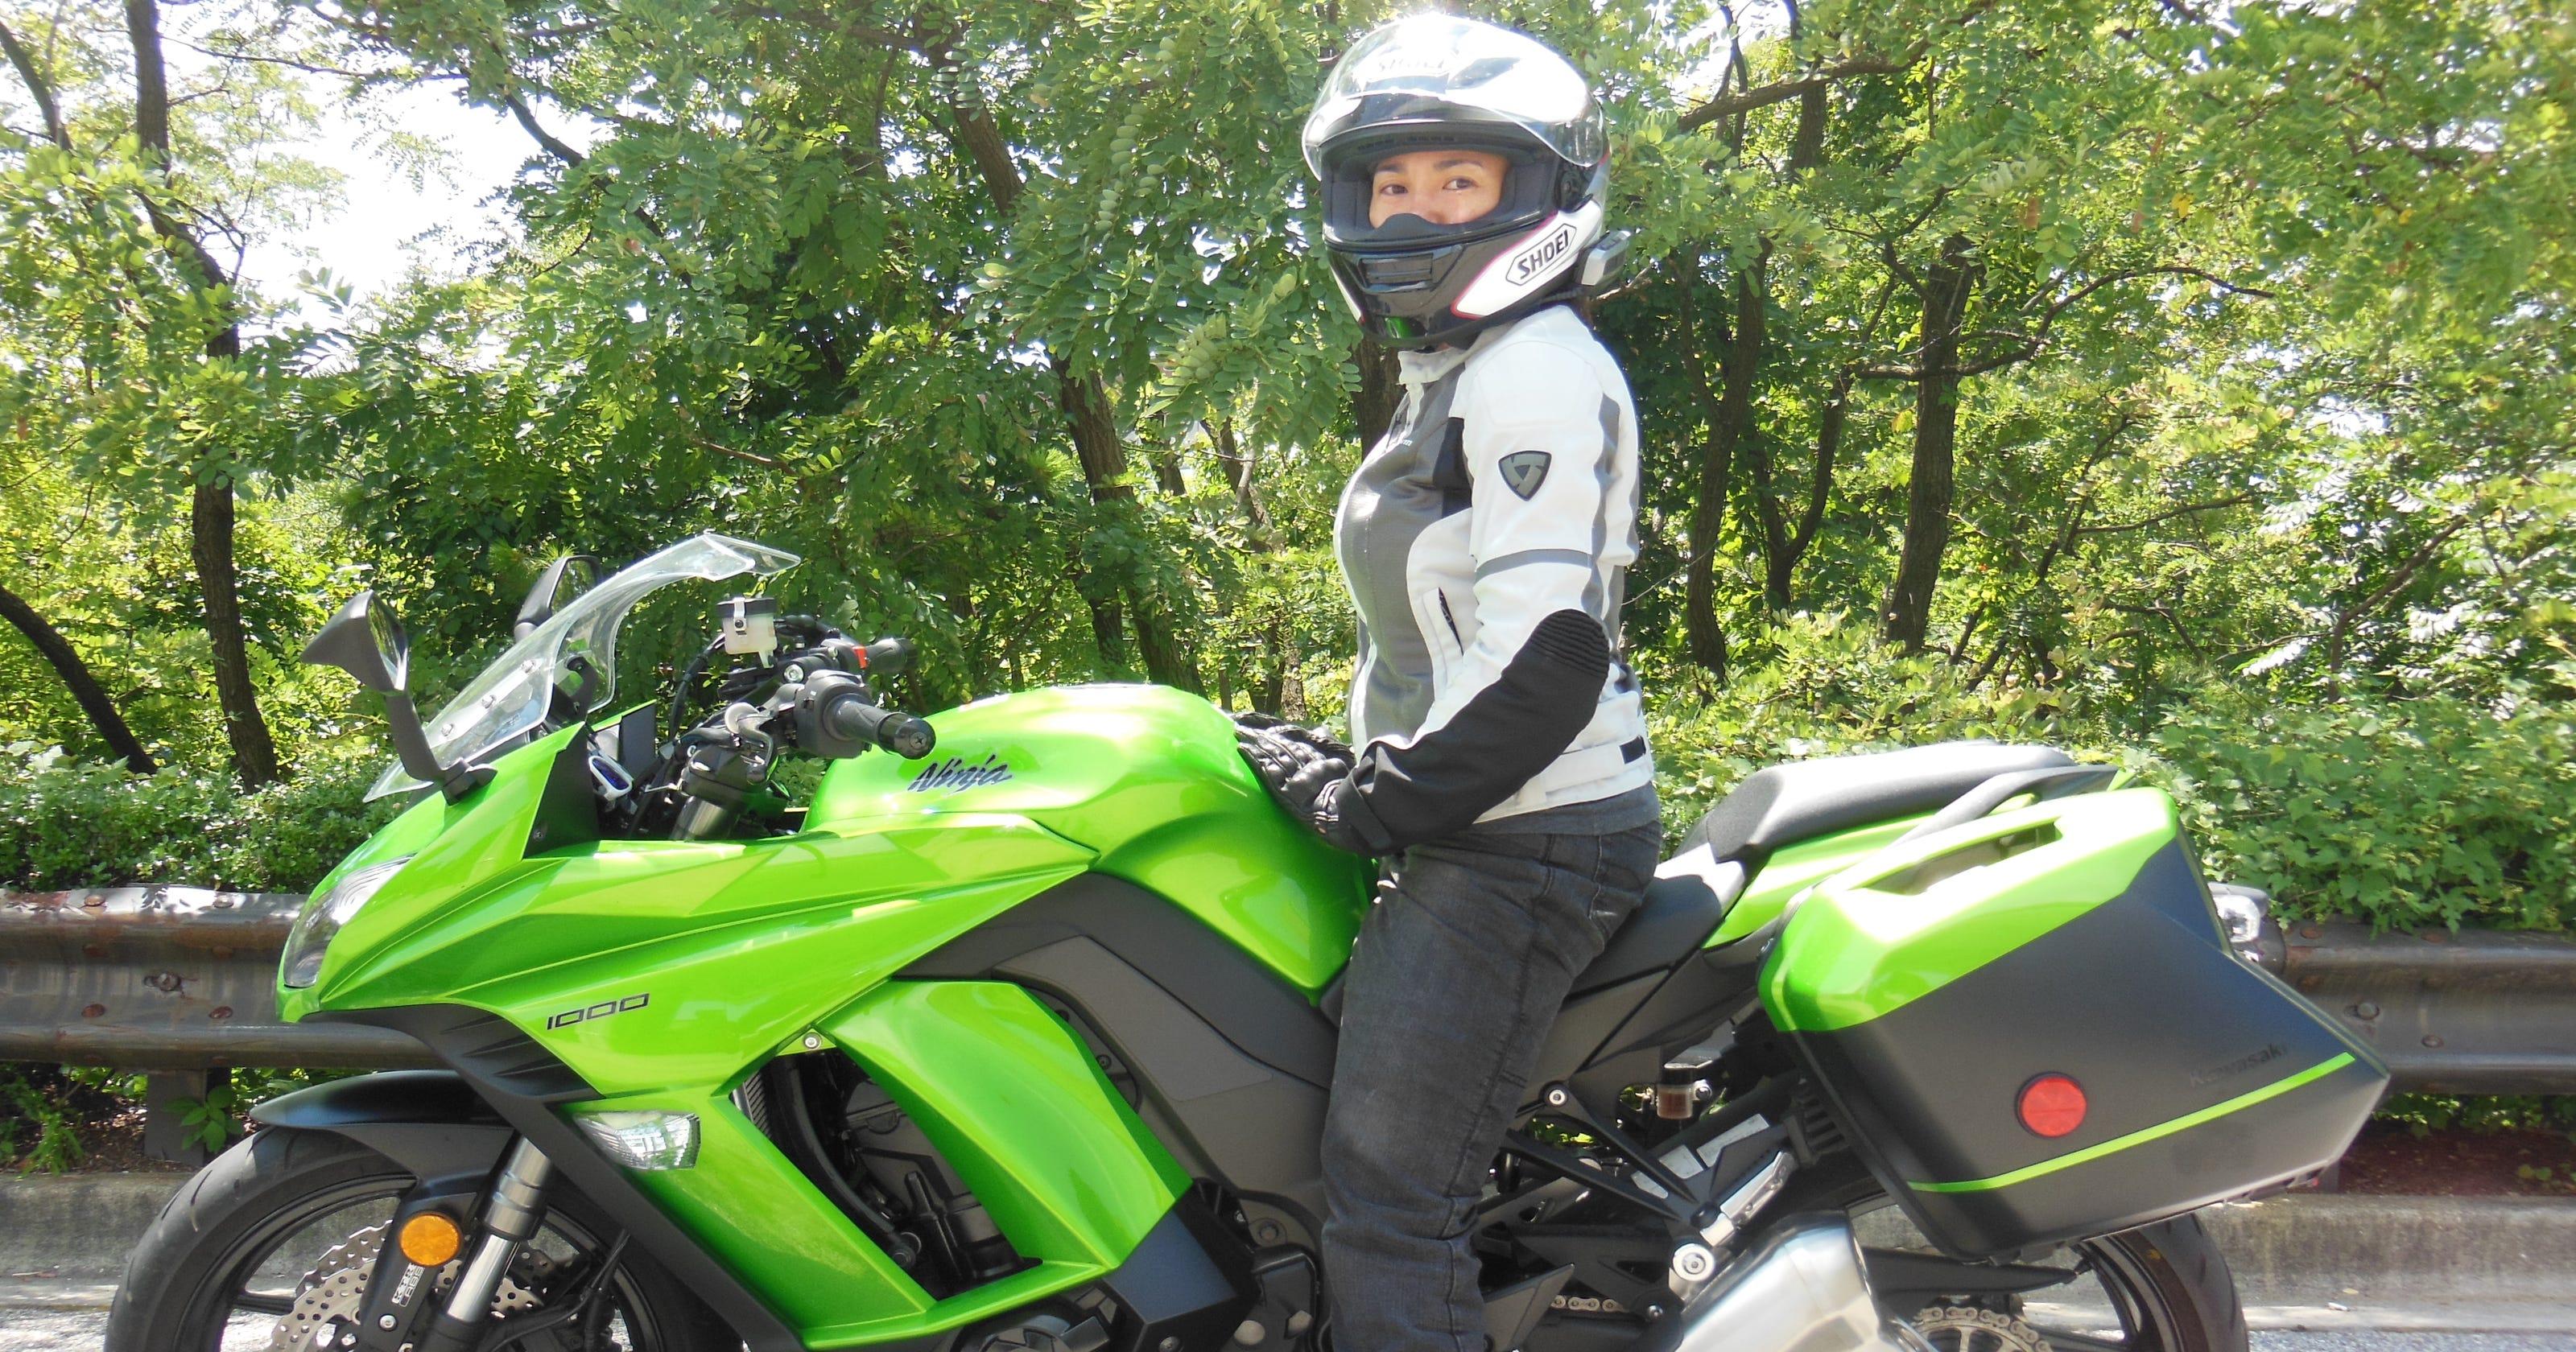 Motorcycle review: Kawasaki Ninja is a sporty tourer